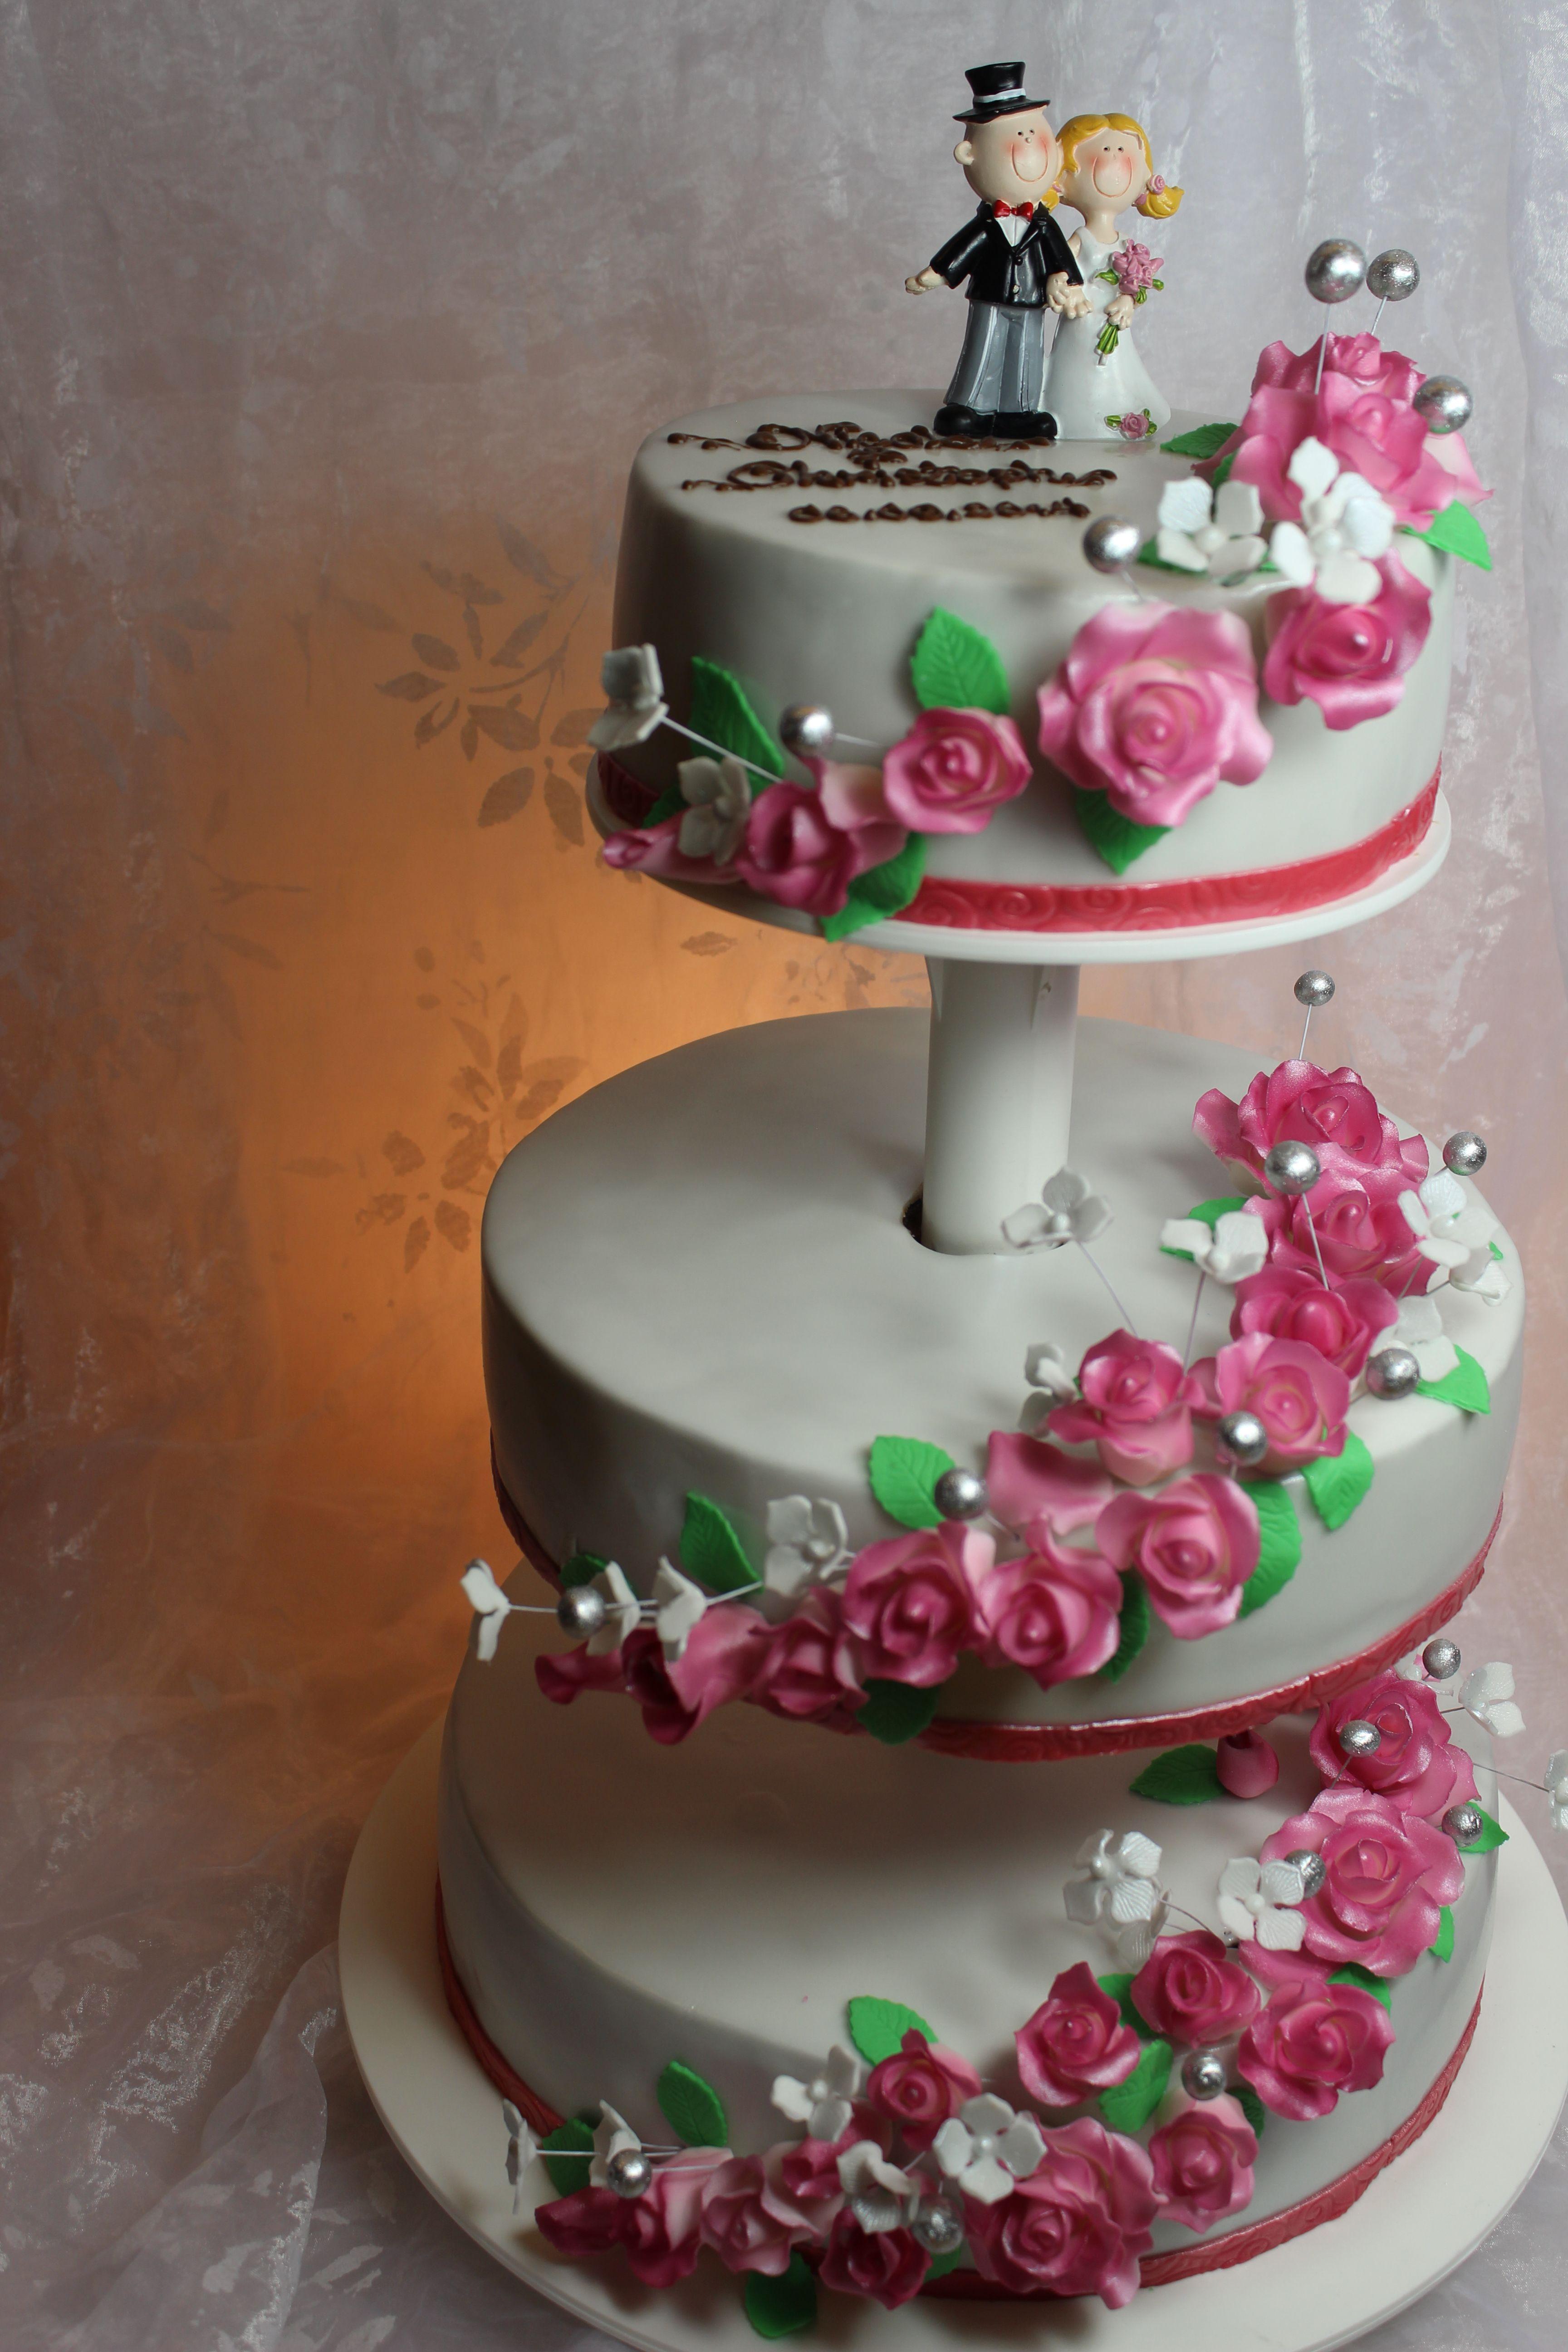 3 tier wedding cake 3 st ckige hochzeitstorte cakes. Black Bedroom Furniture Sets. Home Design Ideas